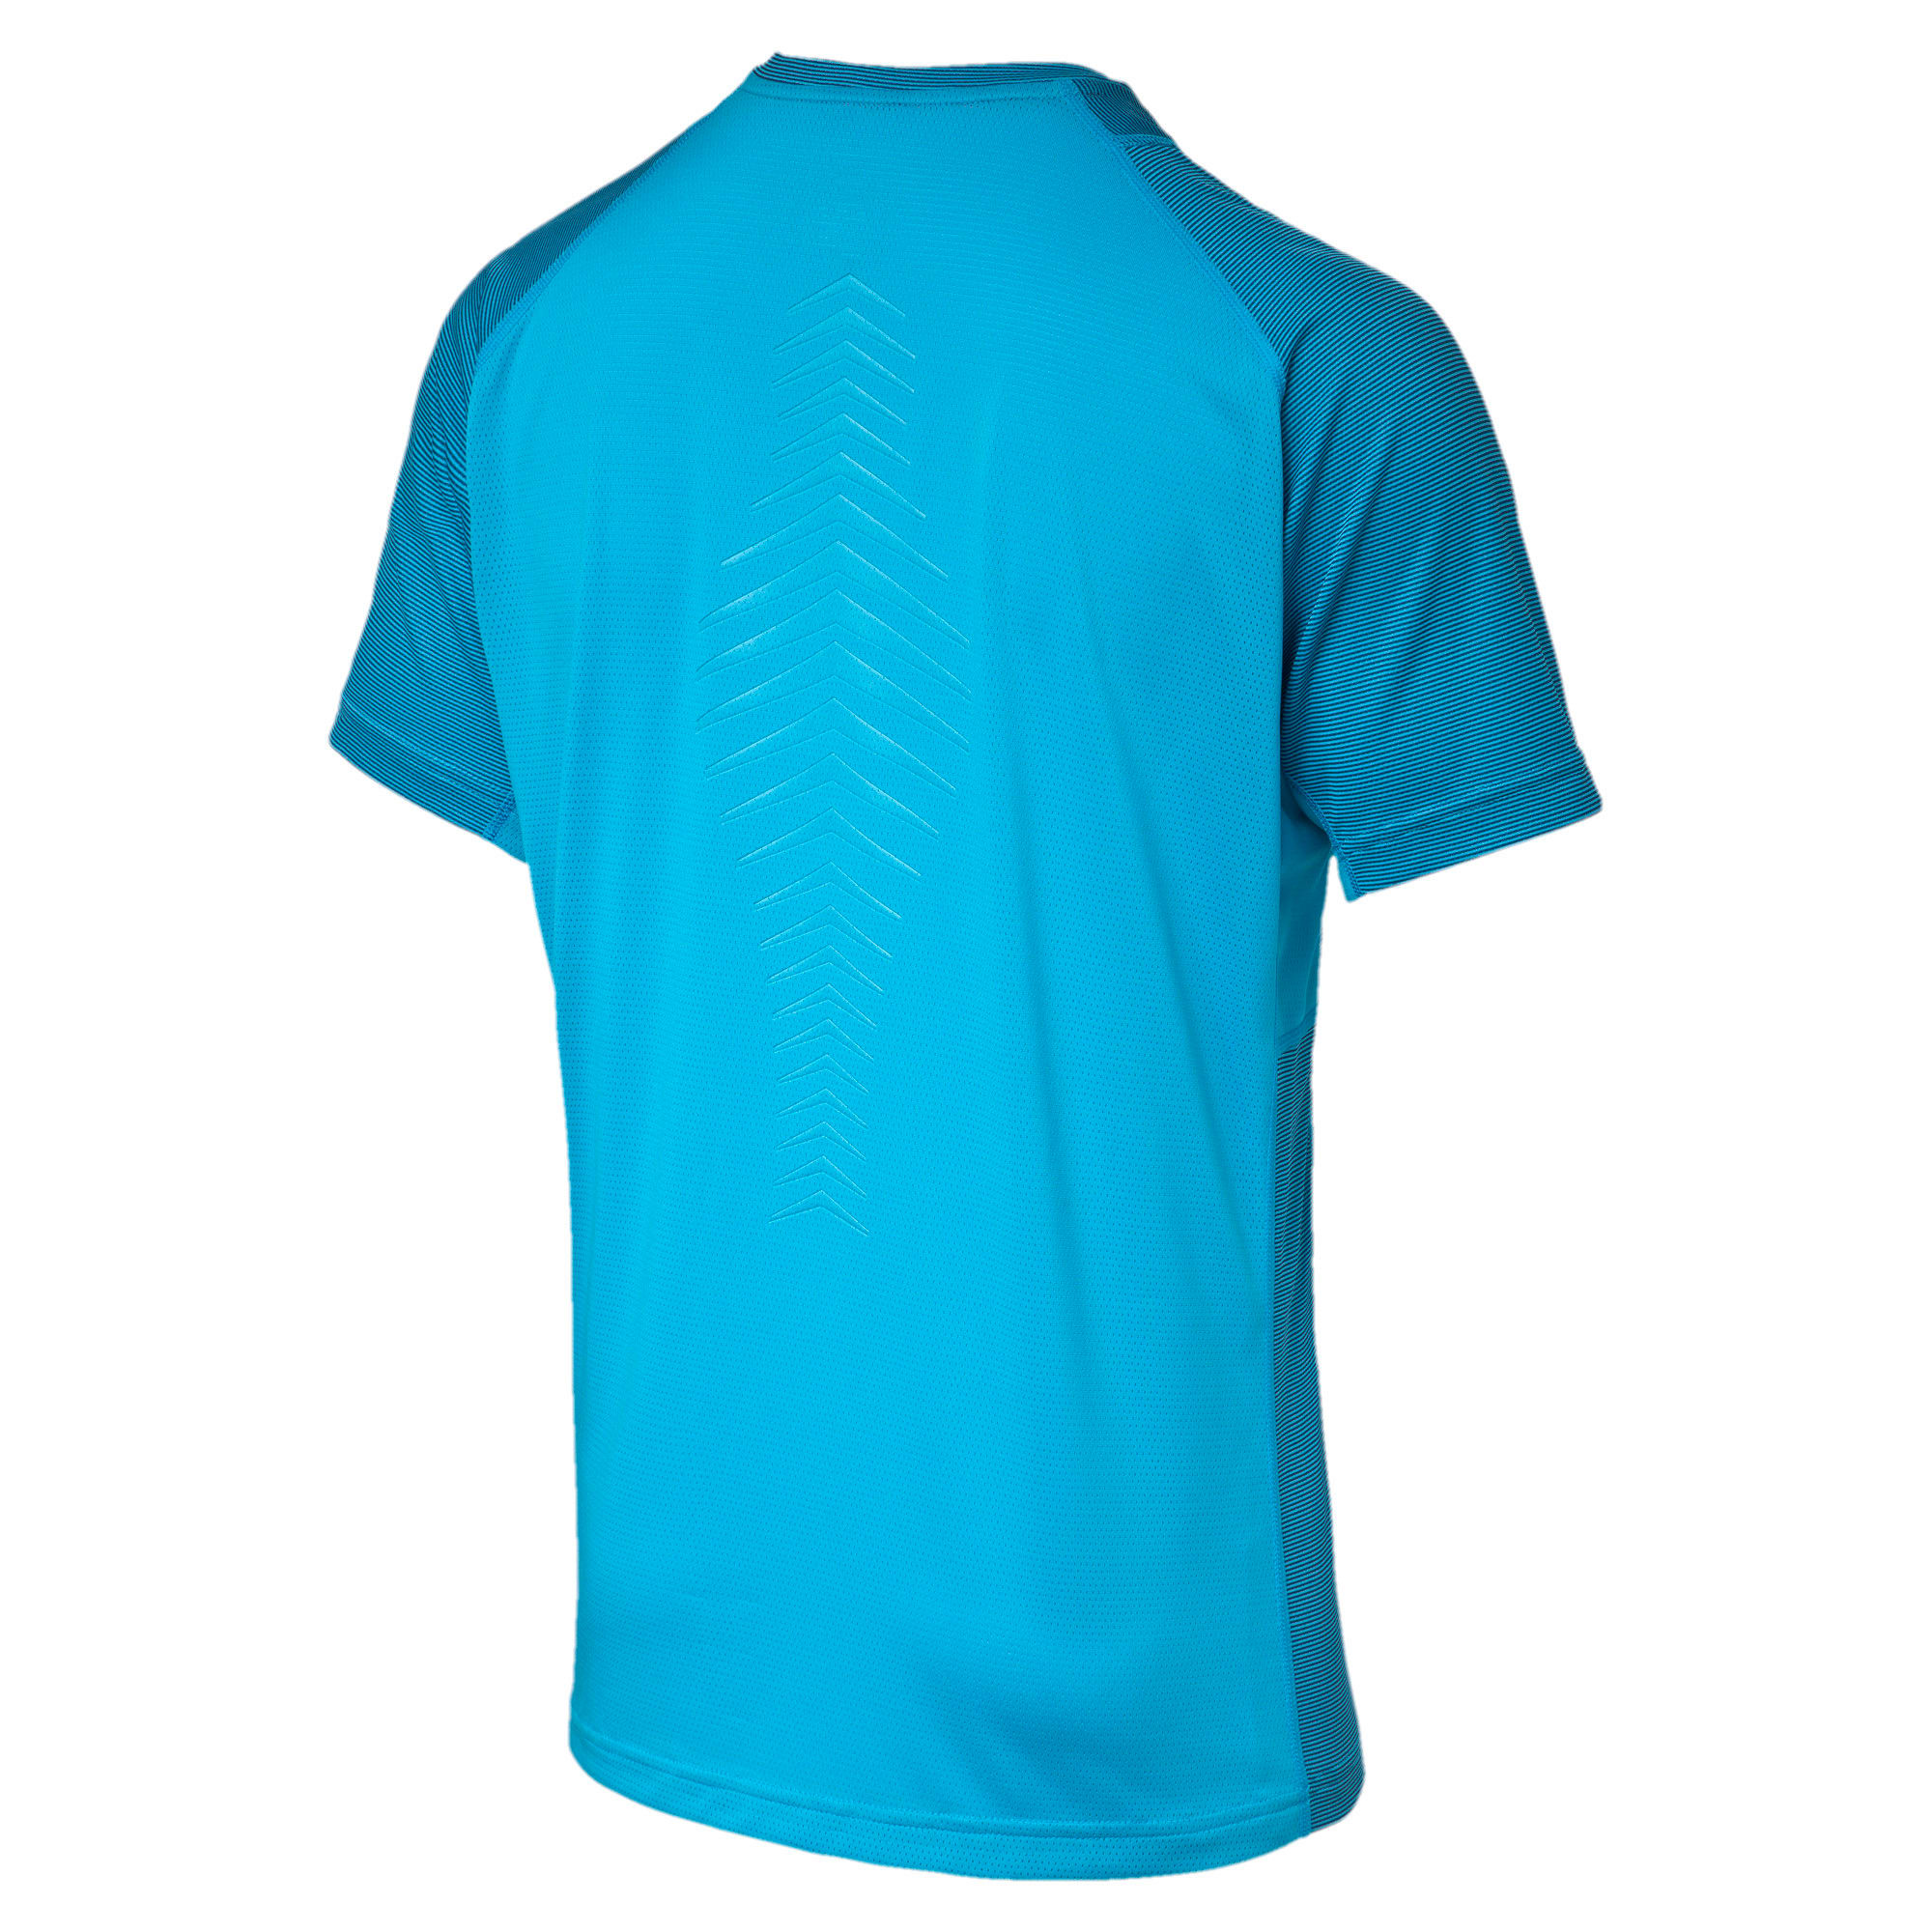 Thumbnail 5 of Active Training Vent Stripe T-Shirt, atomic blue-w/ Black, medium-IND